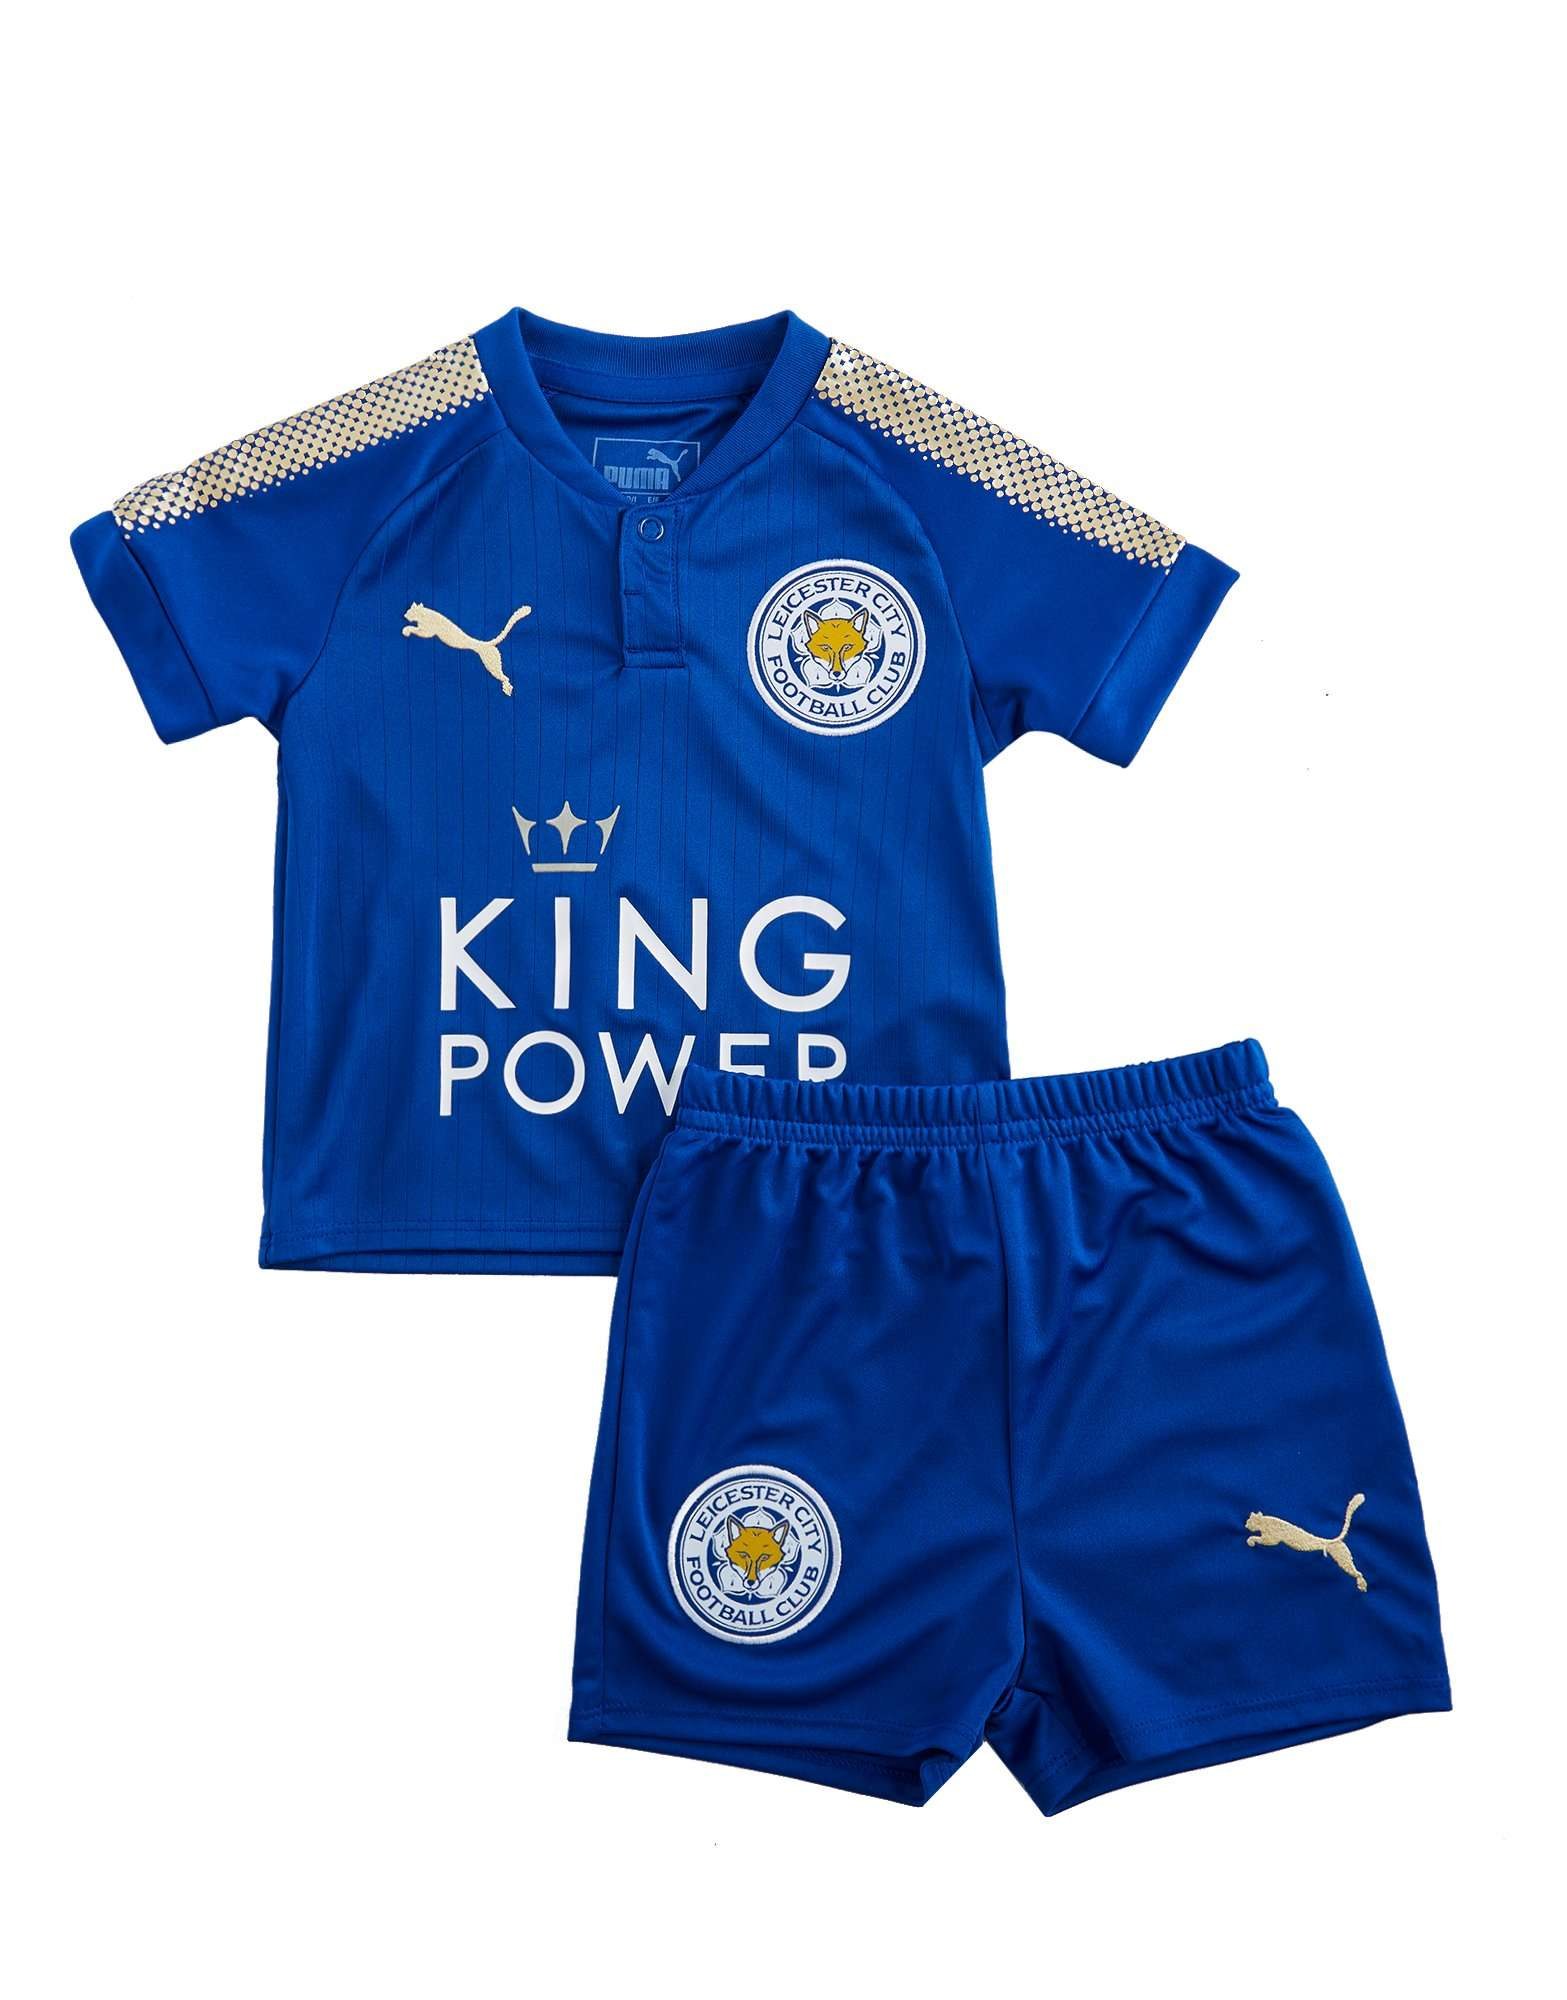 PUMA Leicester City FC 2017/18 Home Kit Infant